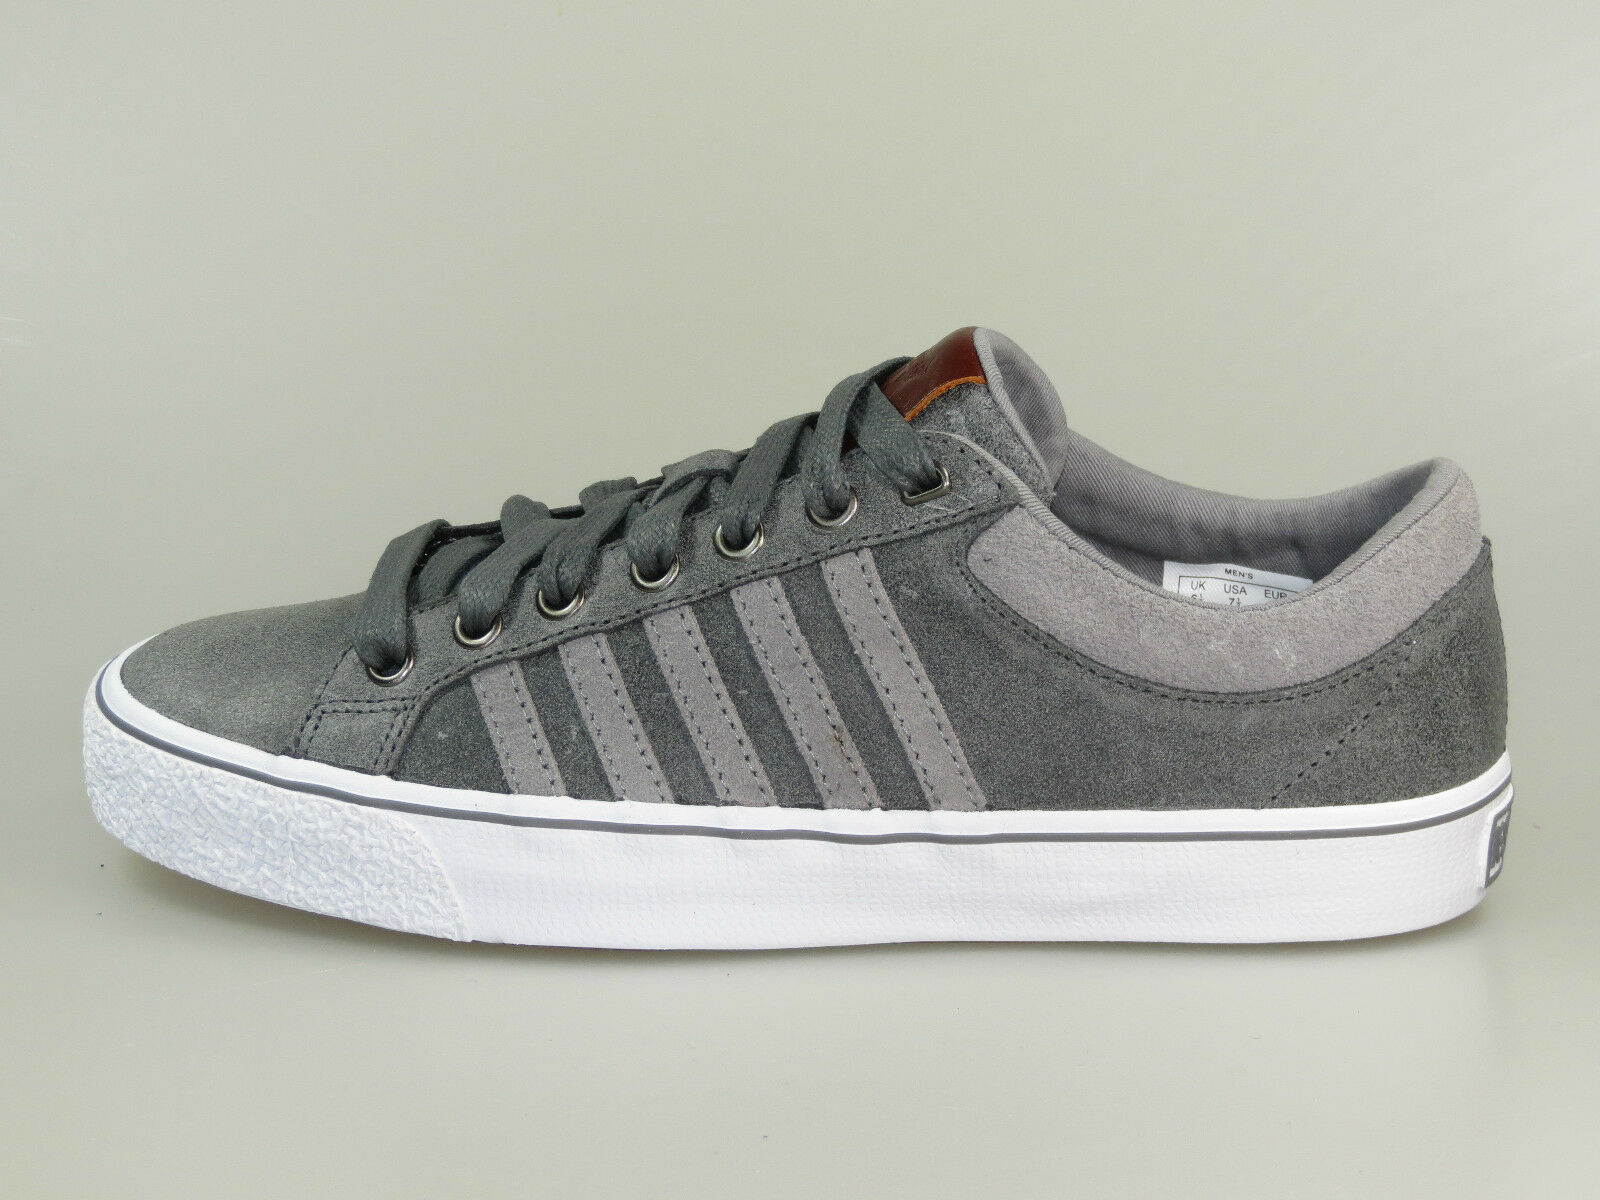 K-SWISS Sneaker ADCOURT LA P VNZ 03131048 Grau Weiß +Neu+ Größe 40 - 45